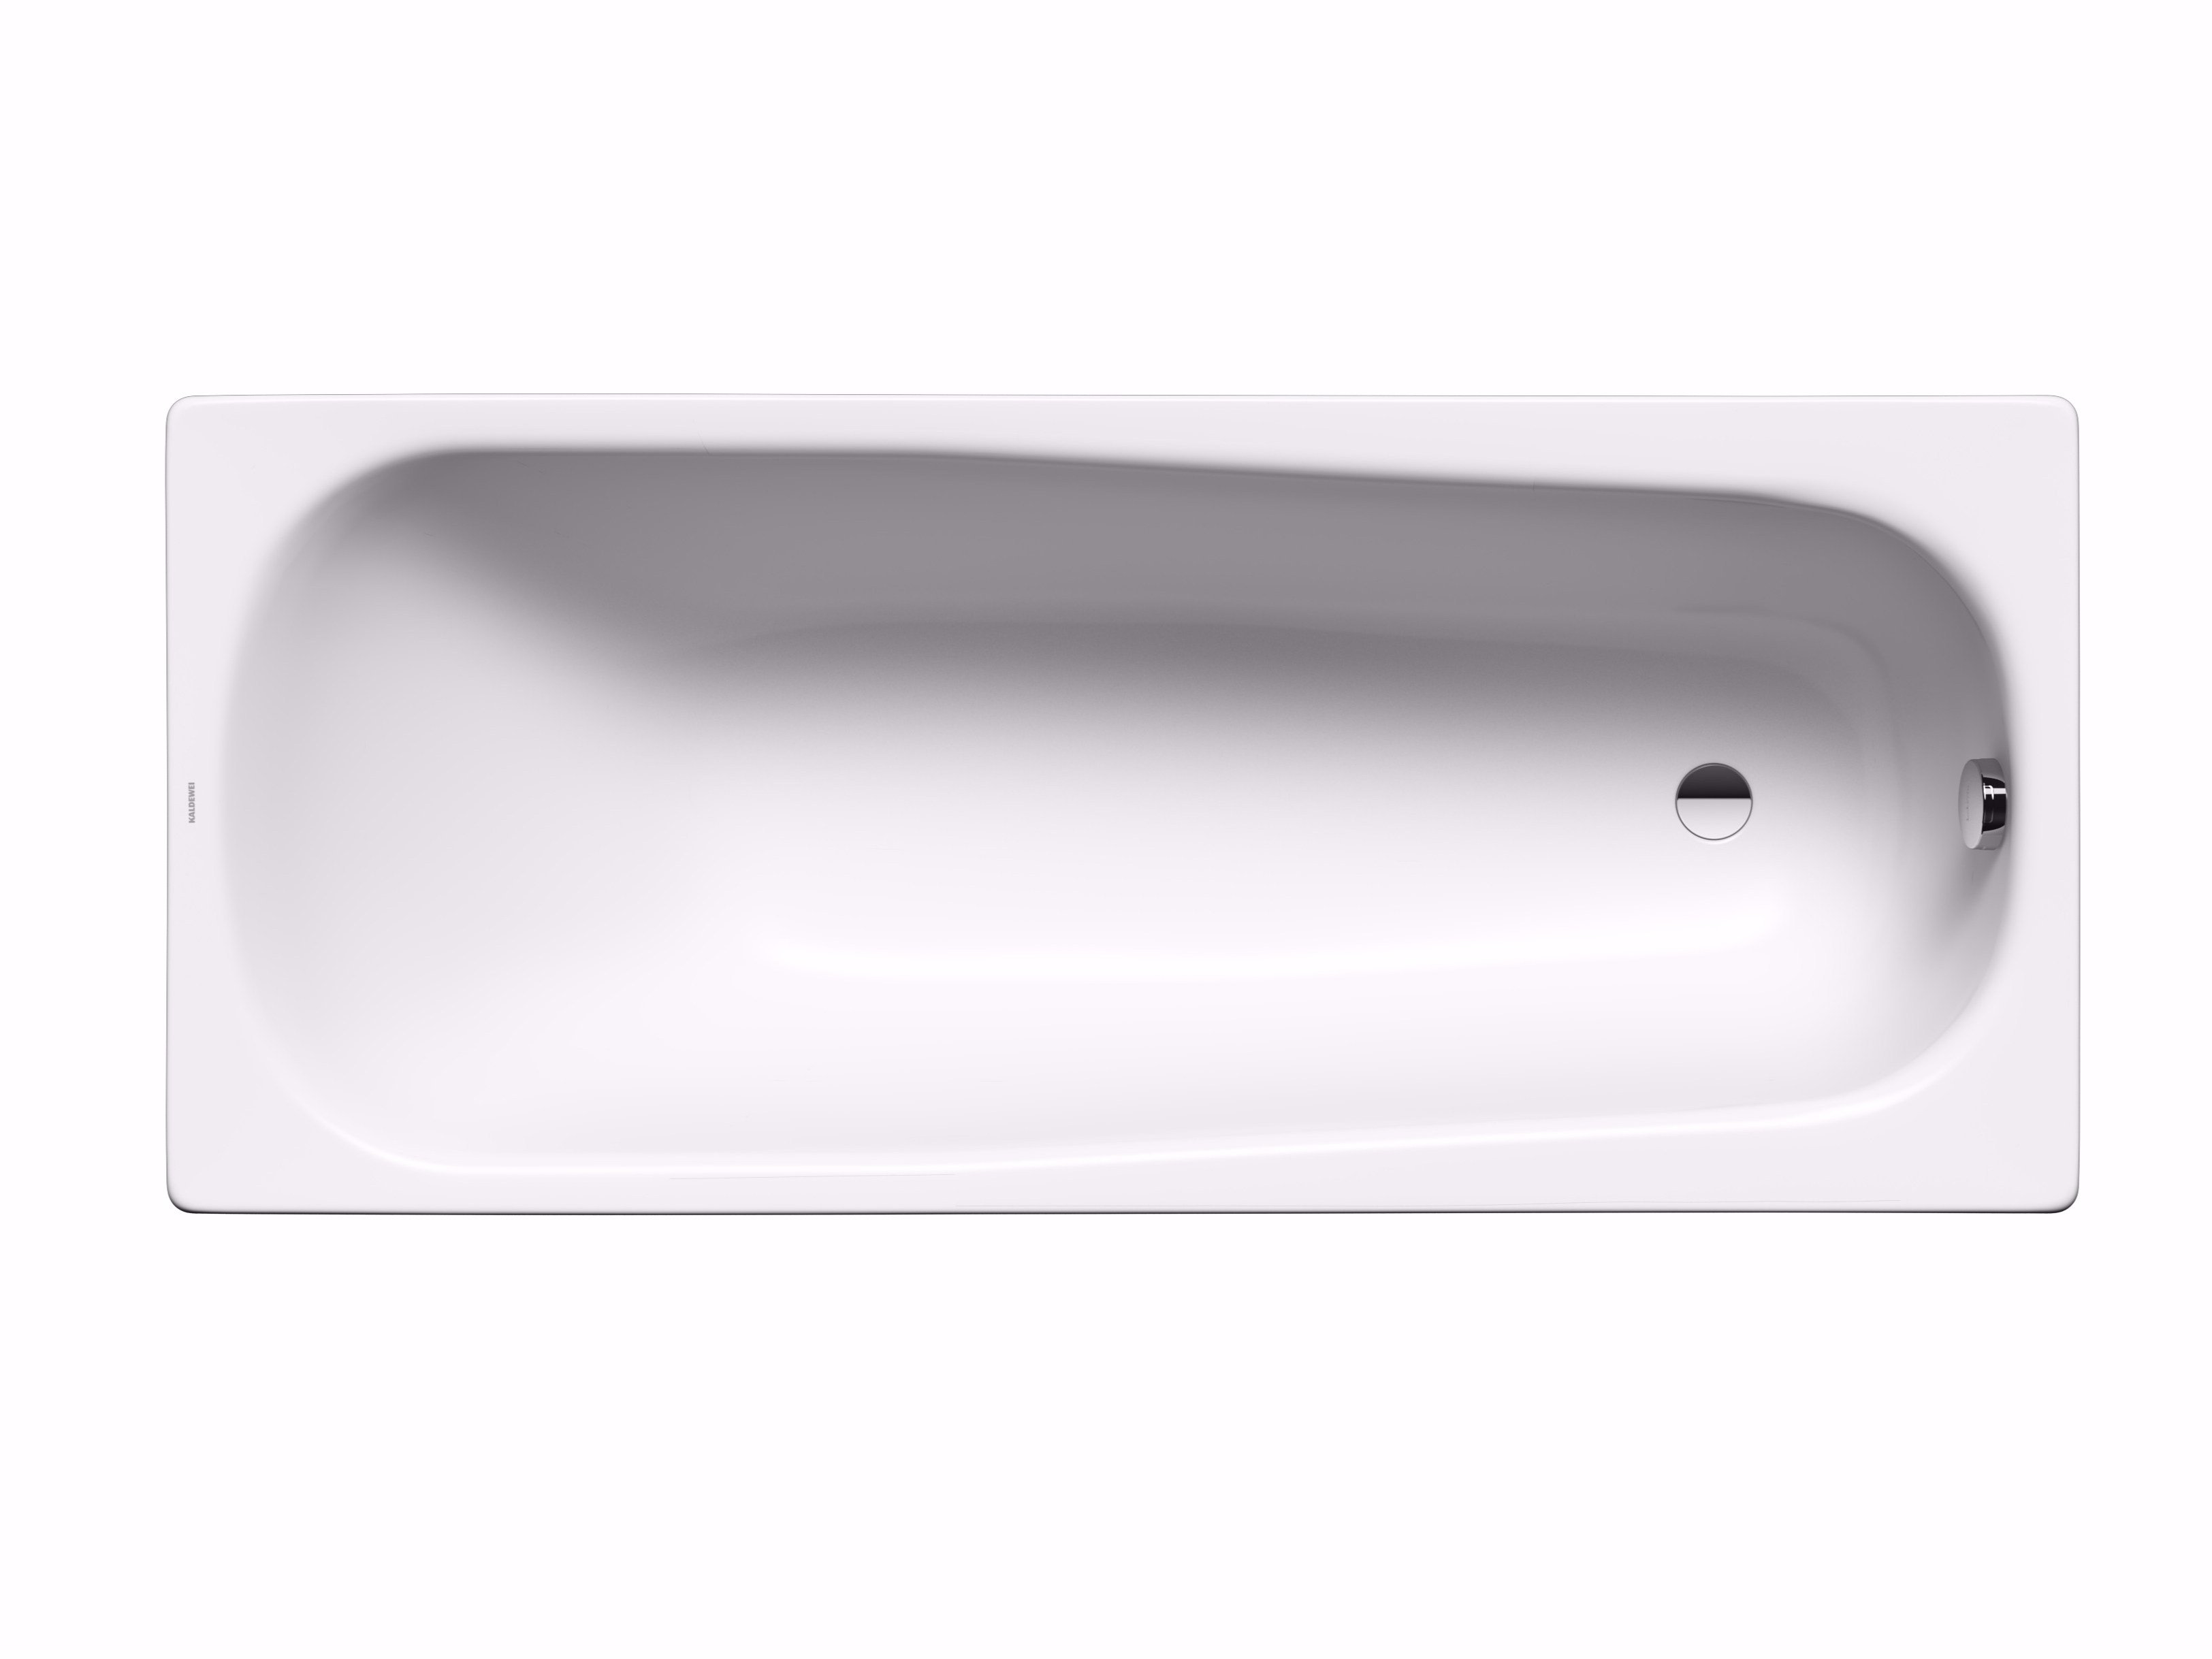 einbau rechteckige badewanne saniform by kaldewei italia. Black Bedroom Furniture Sets. Home Design Ideas